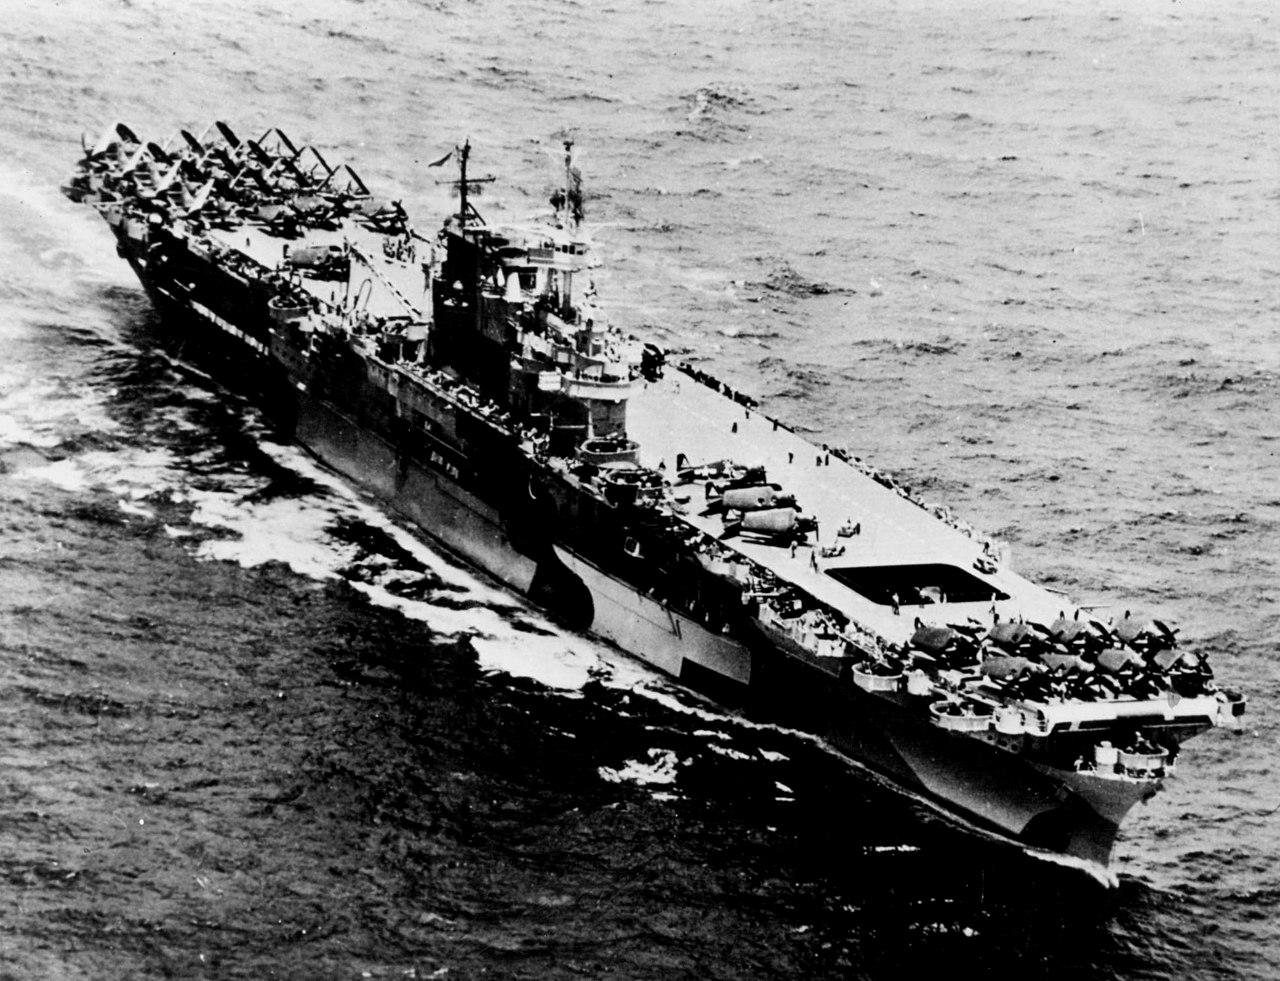 1280px-USS_Enterprise_%28CV-6%29_off_Pea